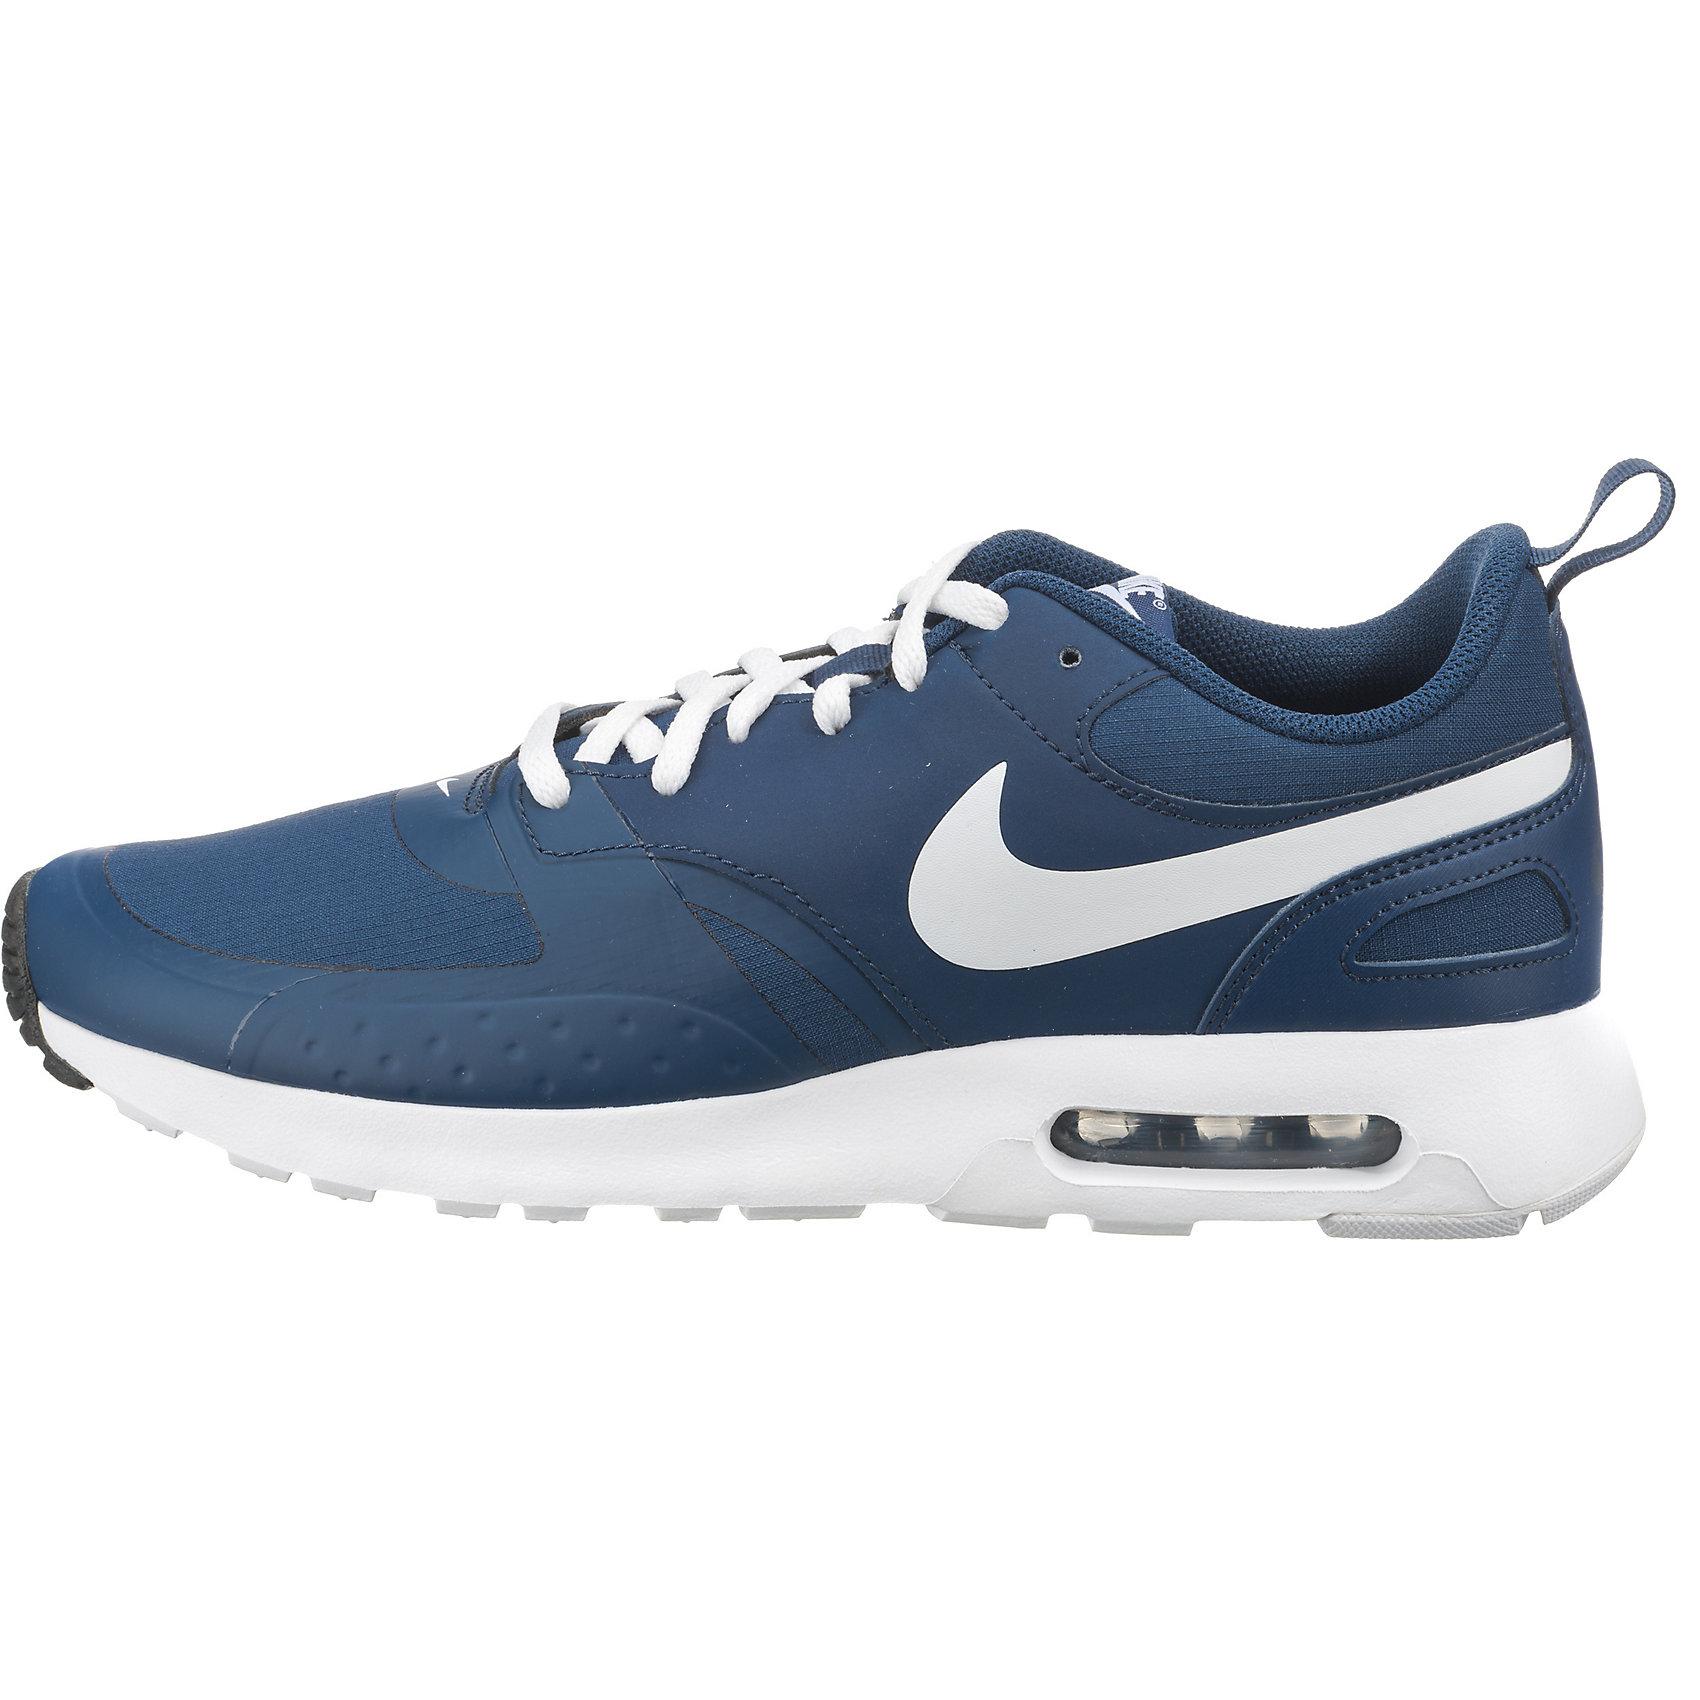 Neu Nike Sportswear Air Max Vision Sneakers 7631479 für Herren